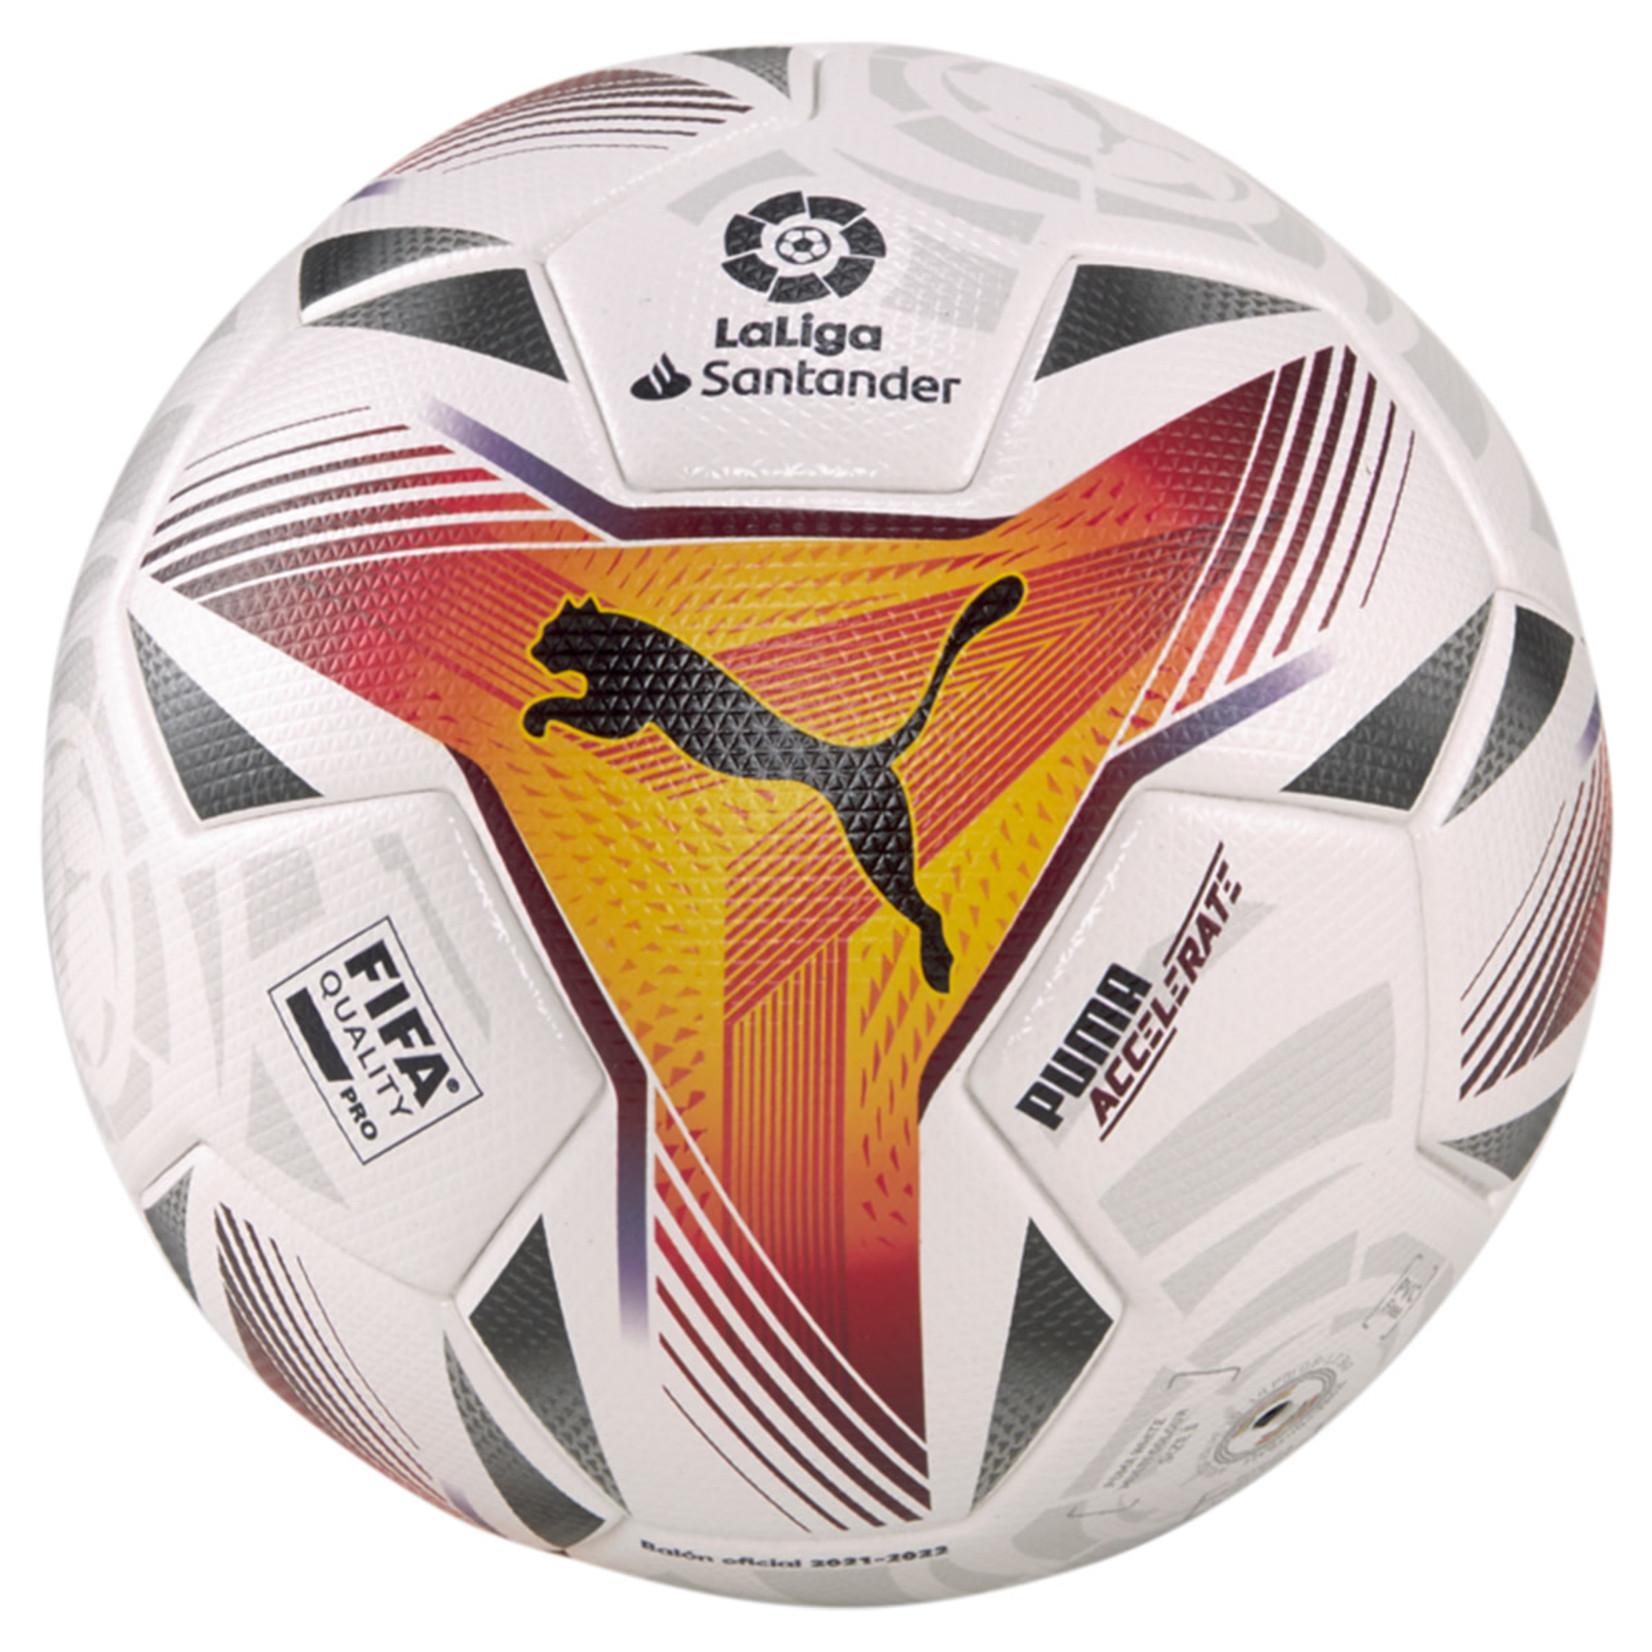 PUMA LA LIGA 1 ACCELERATE FIFA QUALITY PRO BALL 21/22 (WHITE)